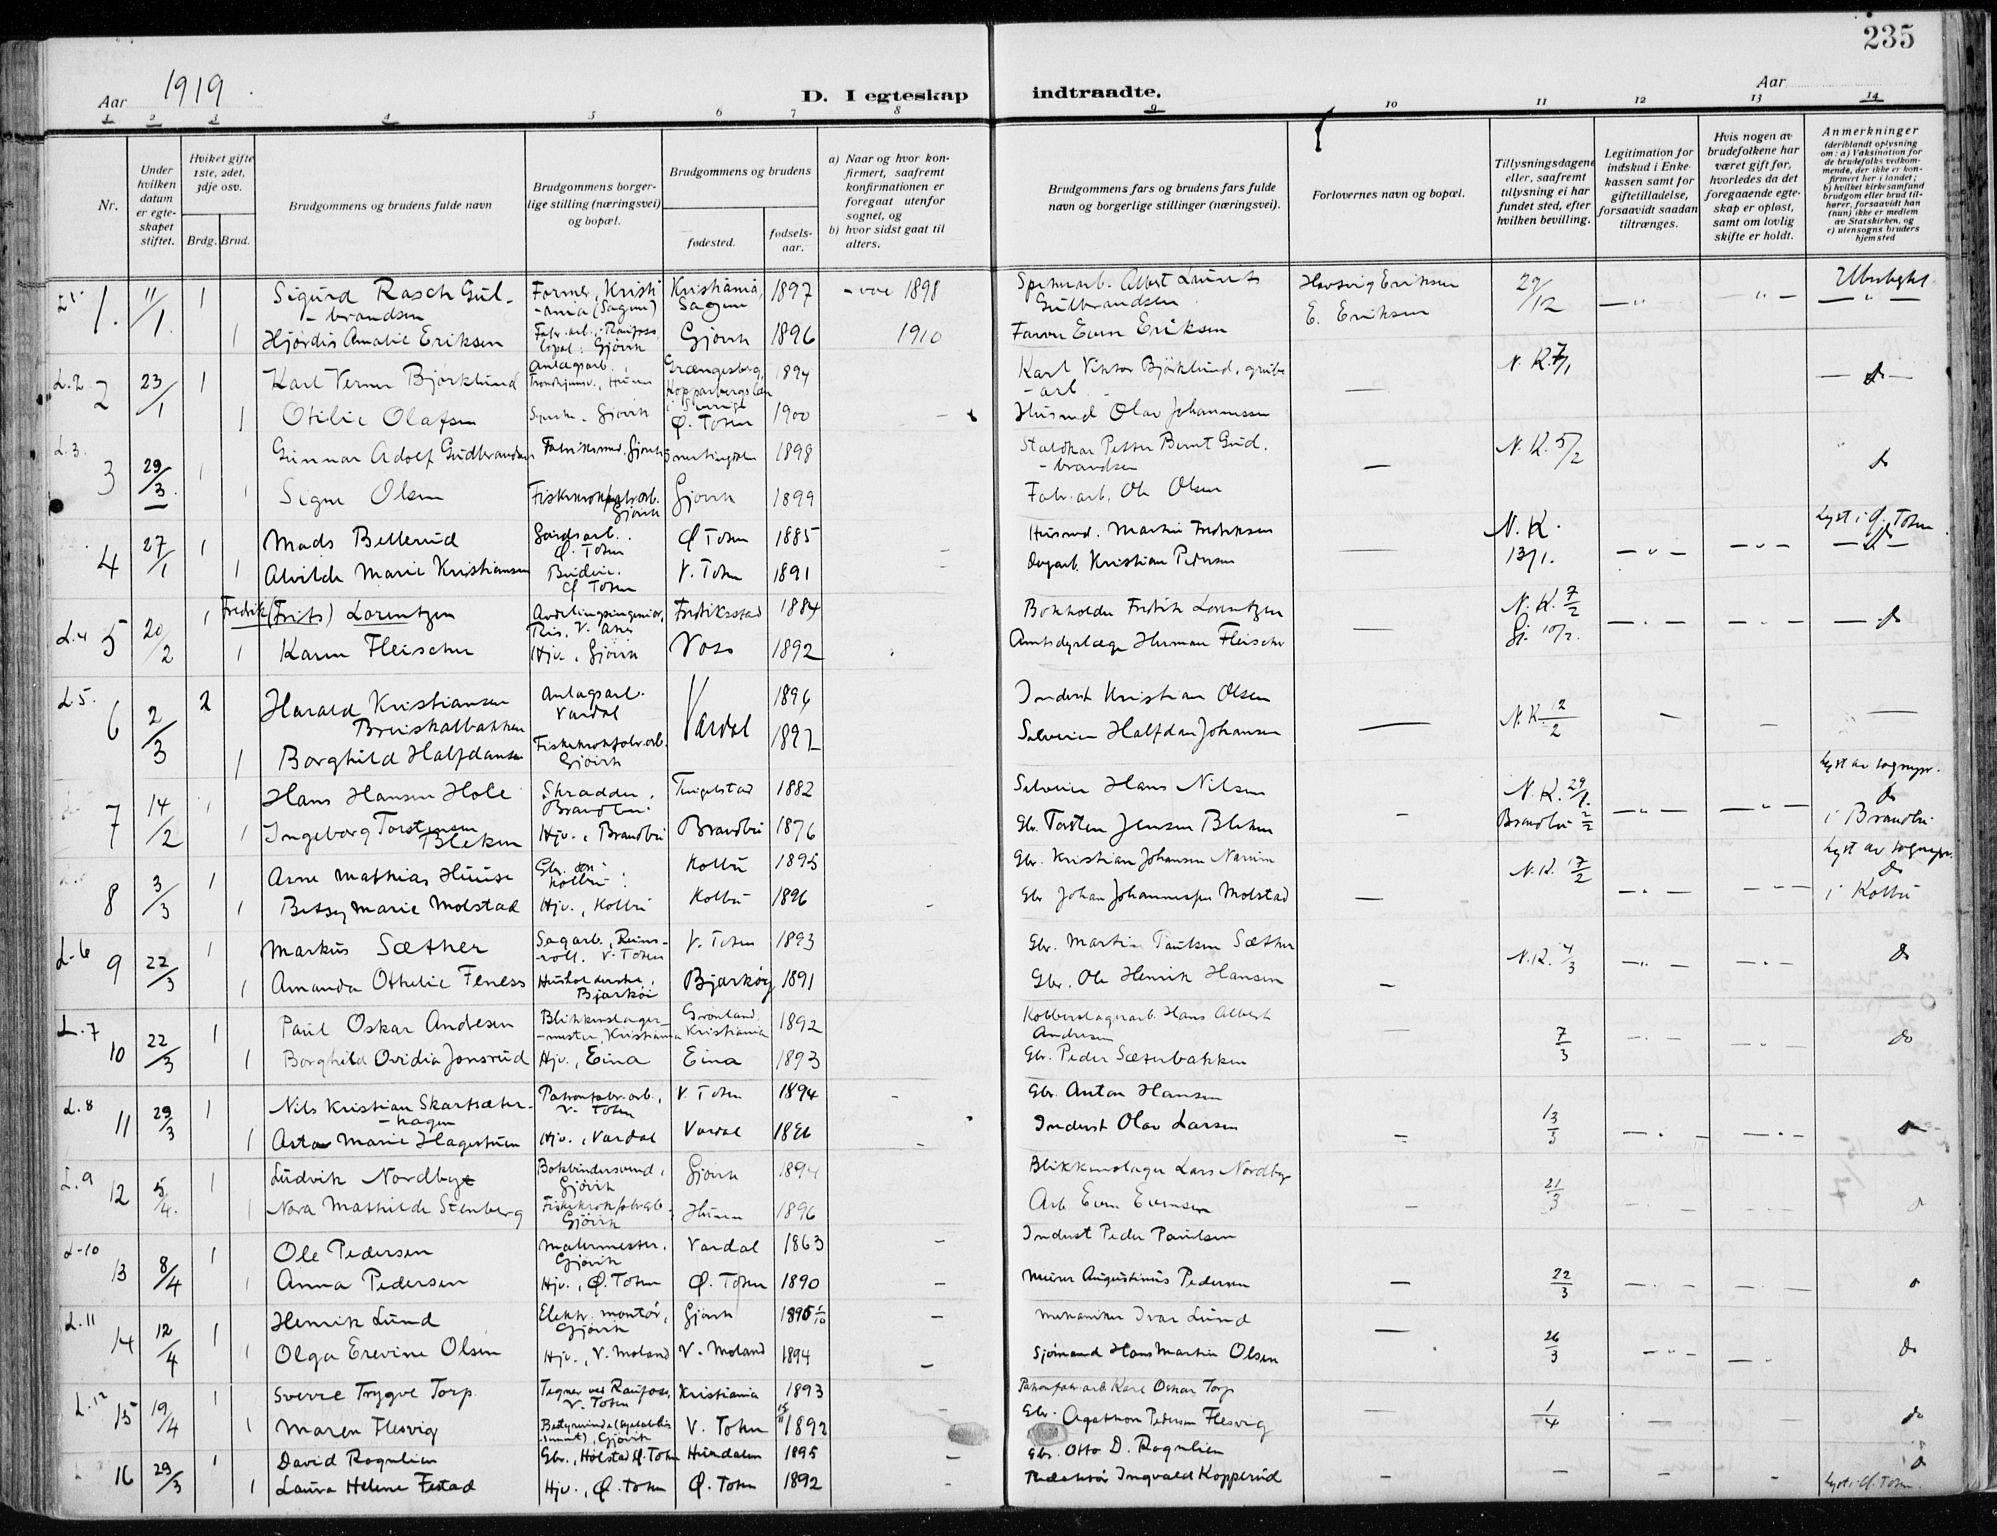 SAH, Vardal prestekontor, H/Ha/Haa/L0014: Ministerialbok nr. 14, 1912-1922, s. 235